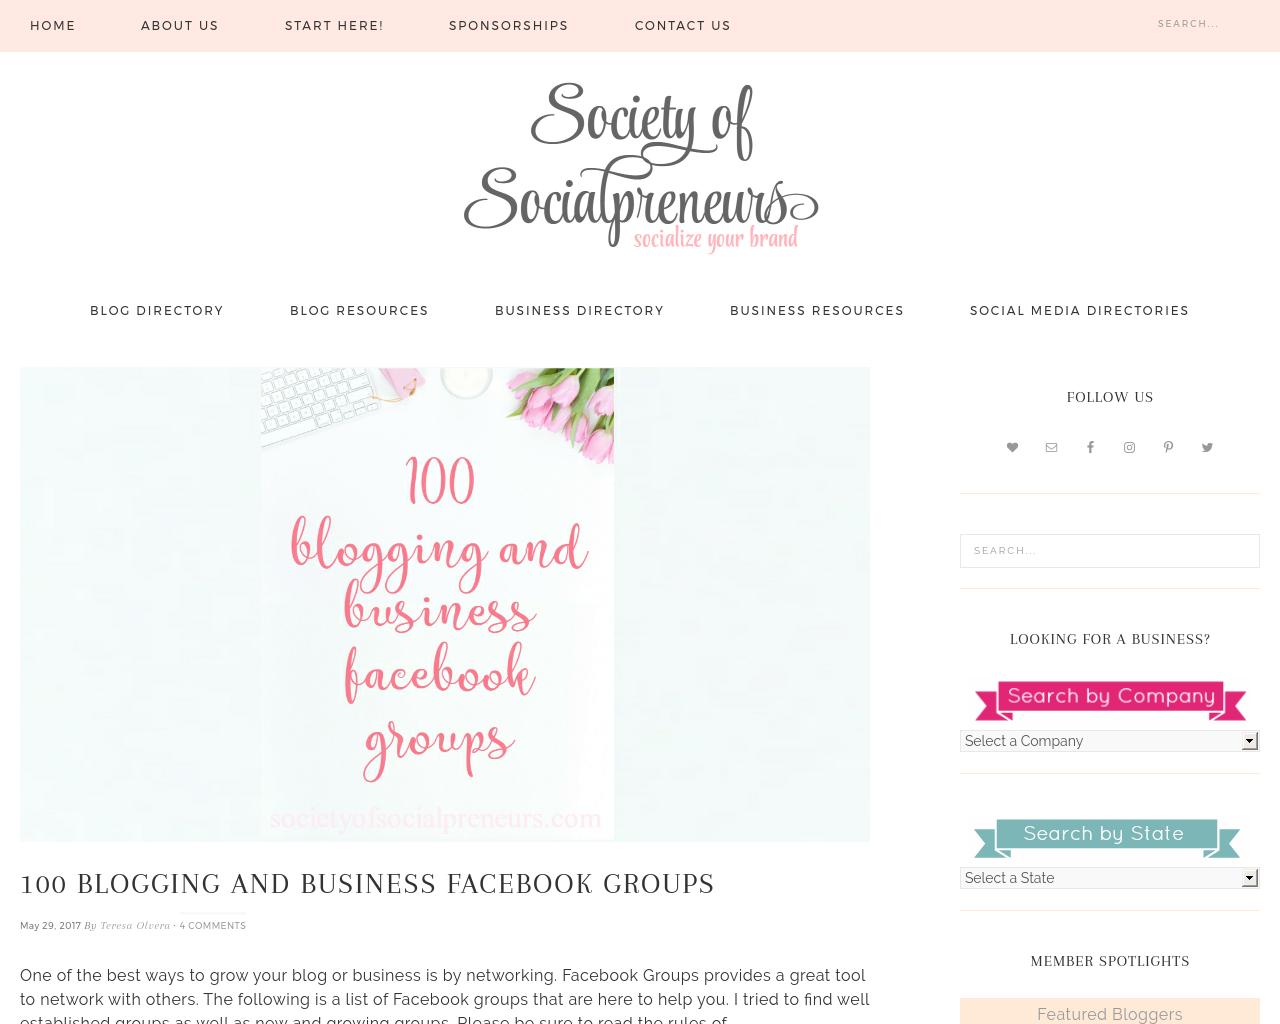 Society-Of-Socialpreneurs-Advertising-Reviews-Pricing